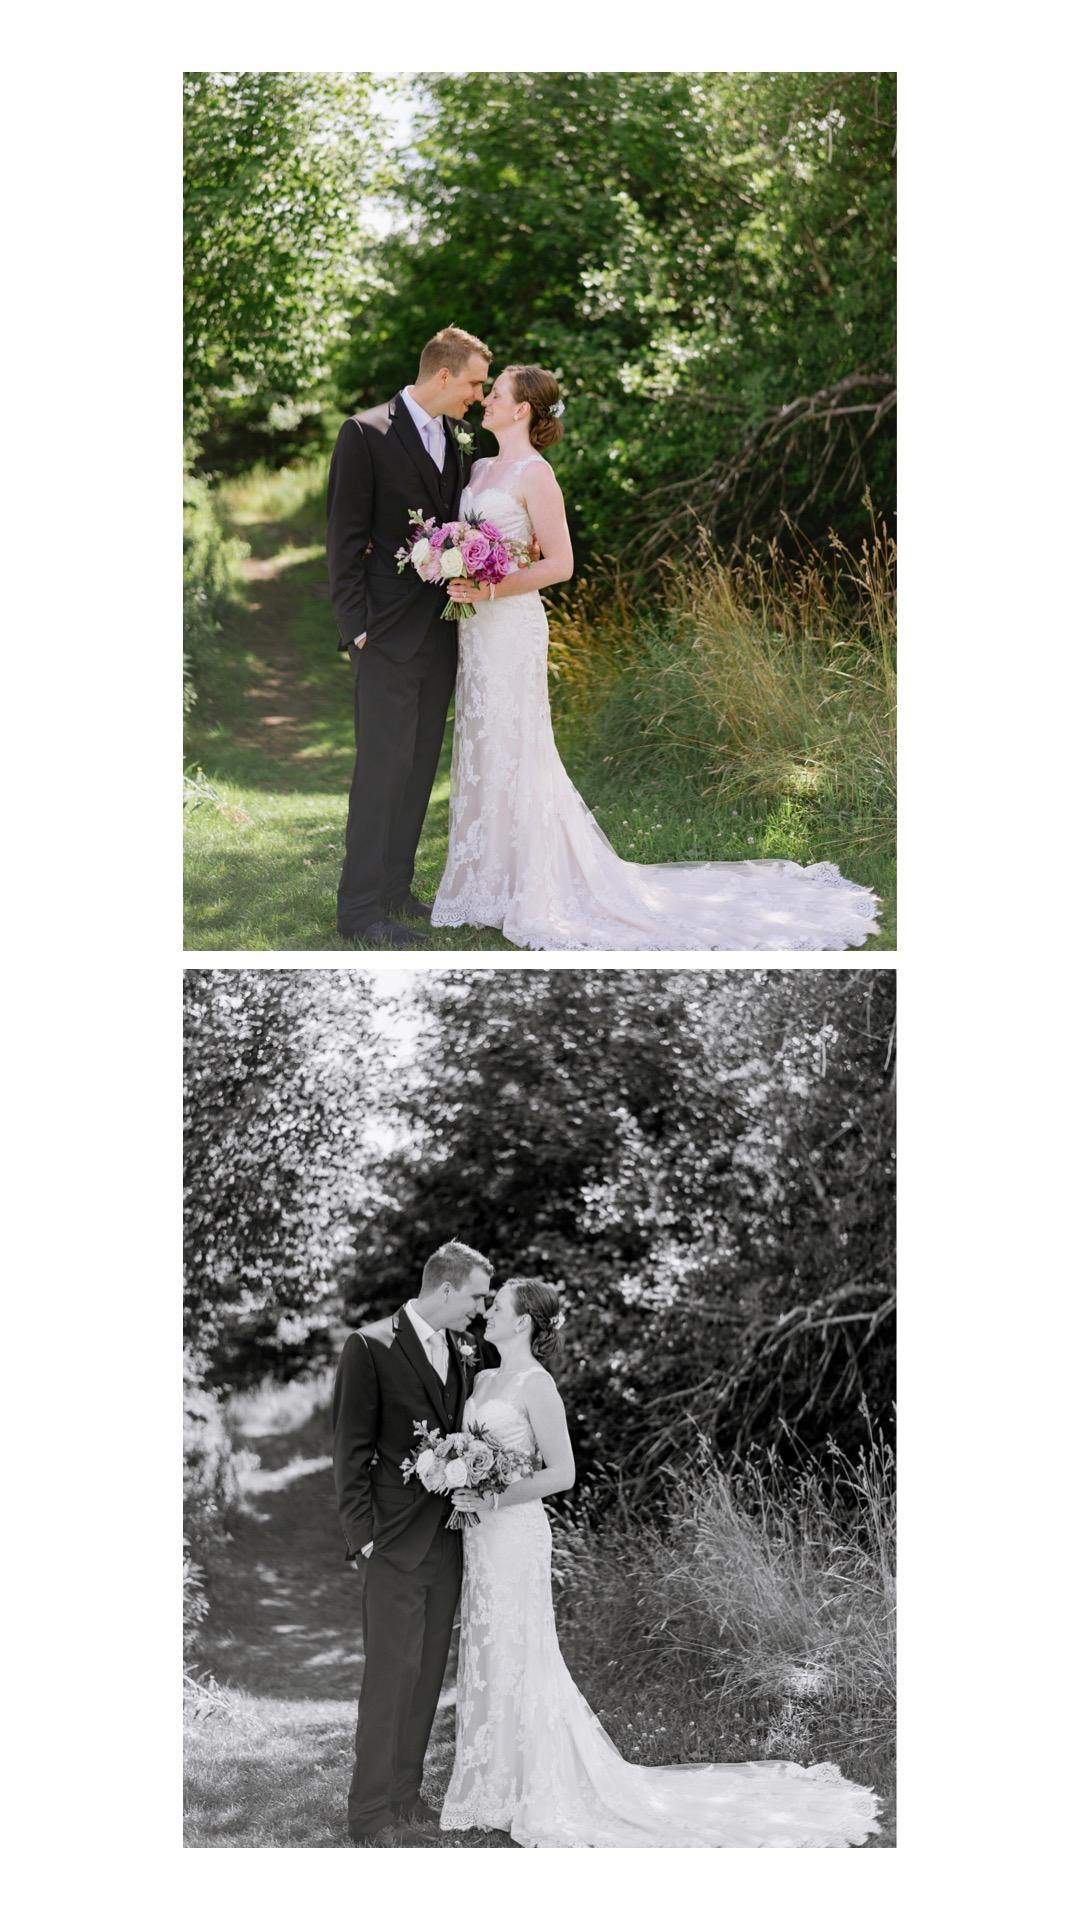 Martina & Scott Halifax Wedding Photographer - Sinead Dubeau Photography 09